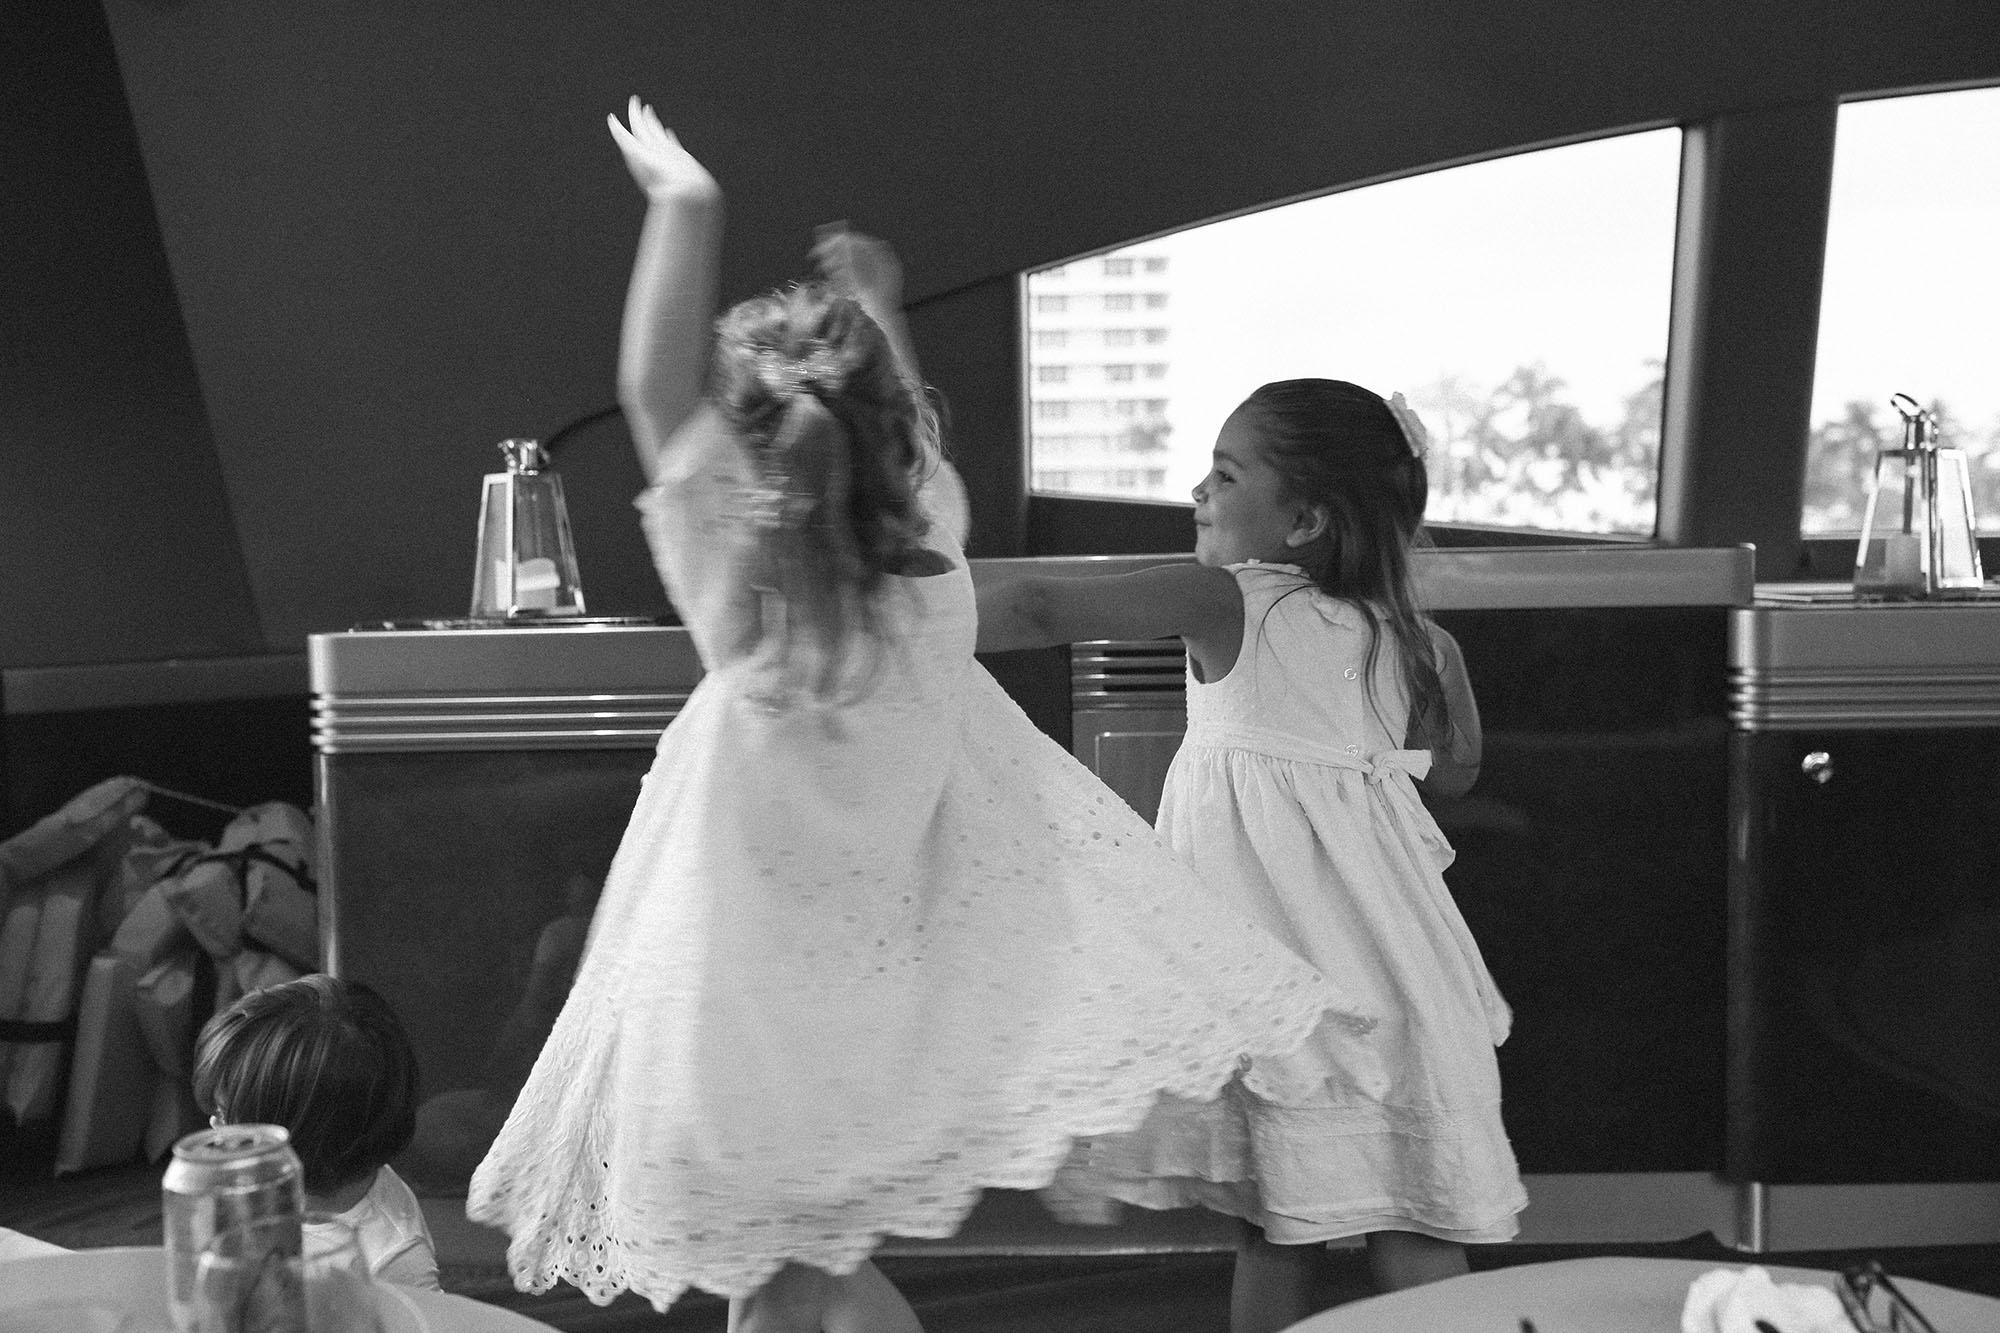 nhl_all_star_break_miami_toddlers_bw27.jpg